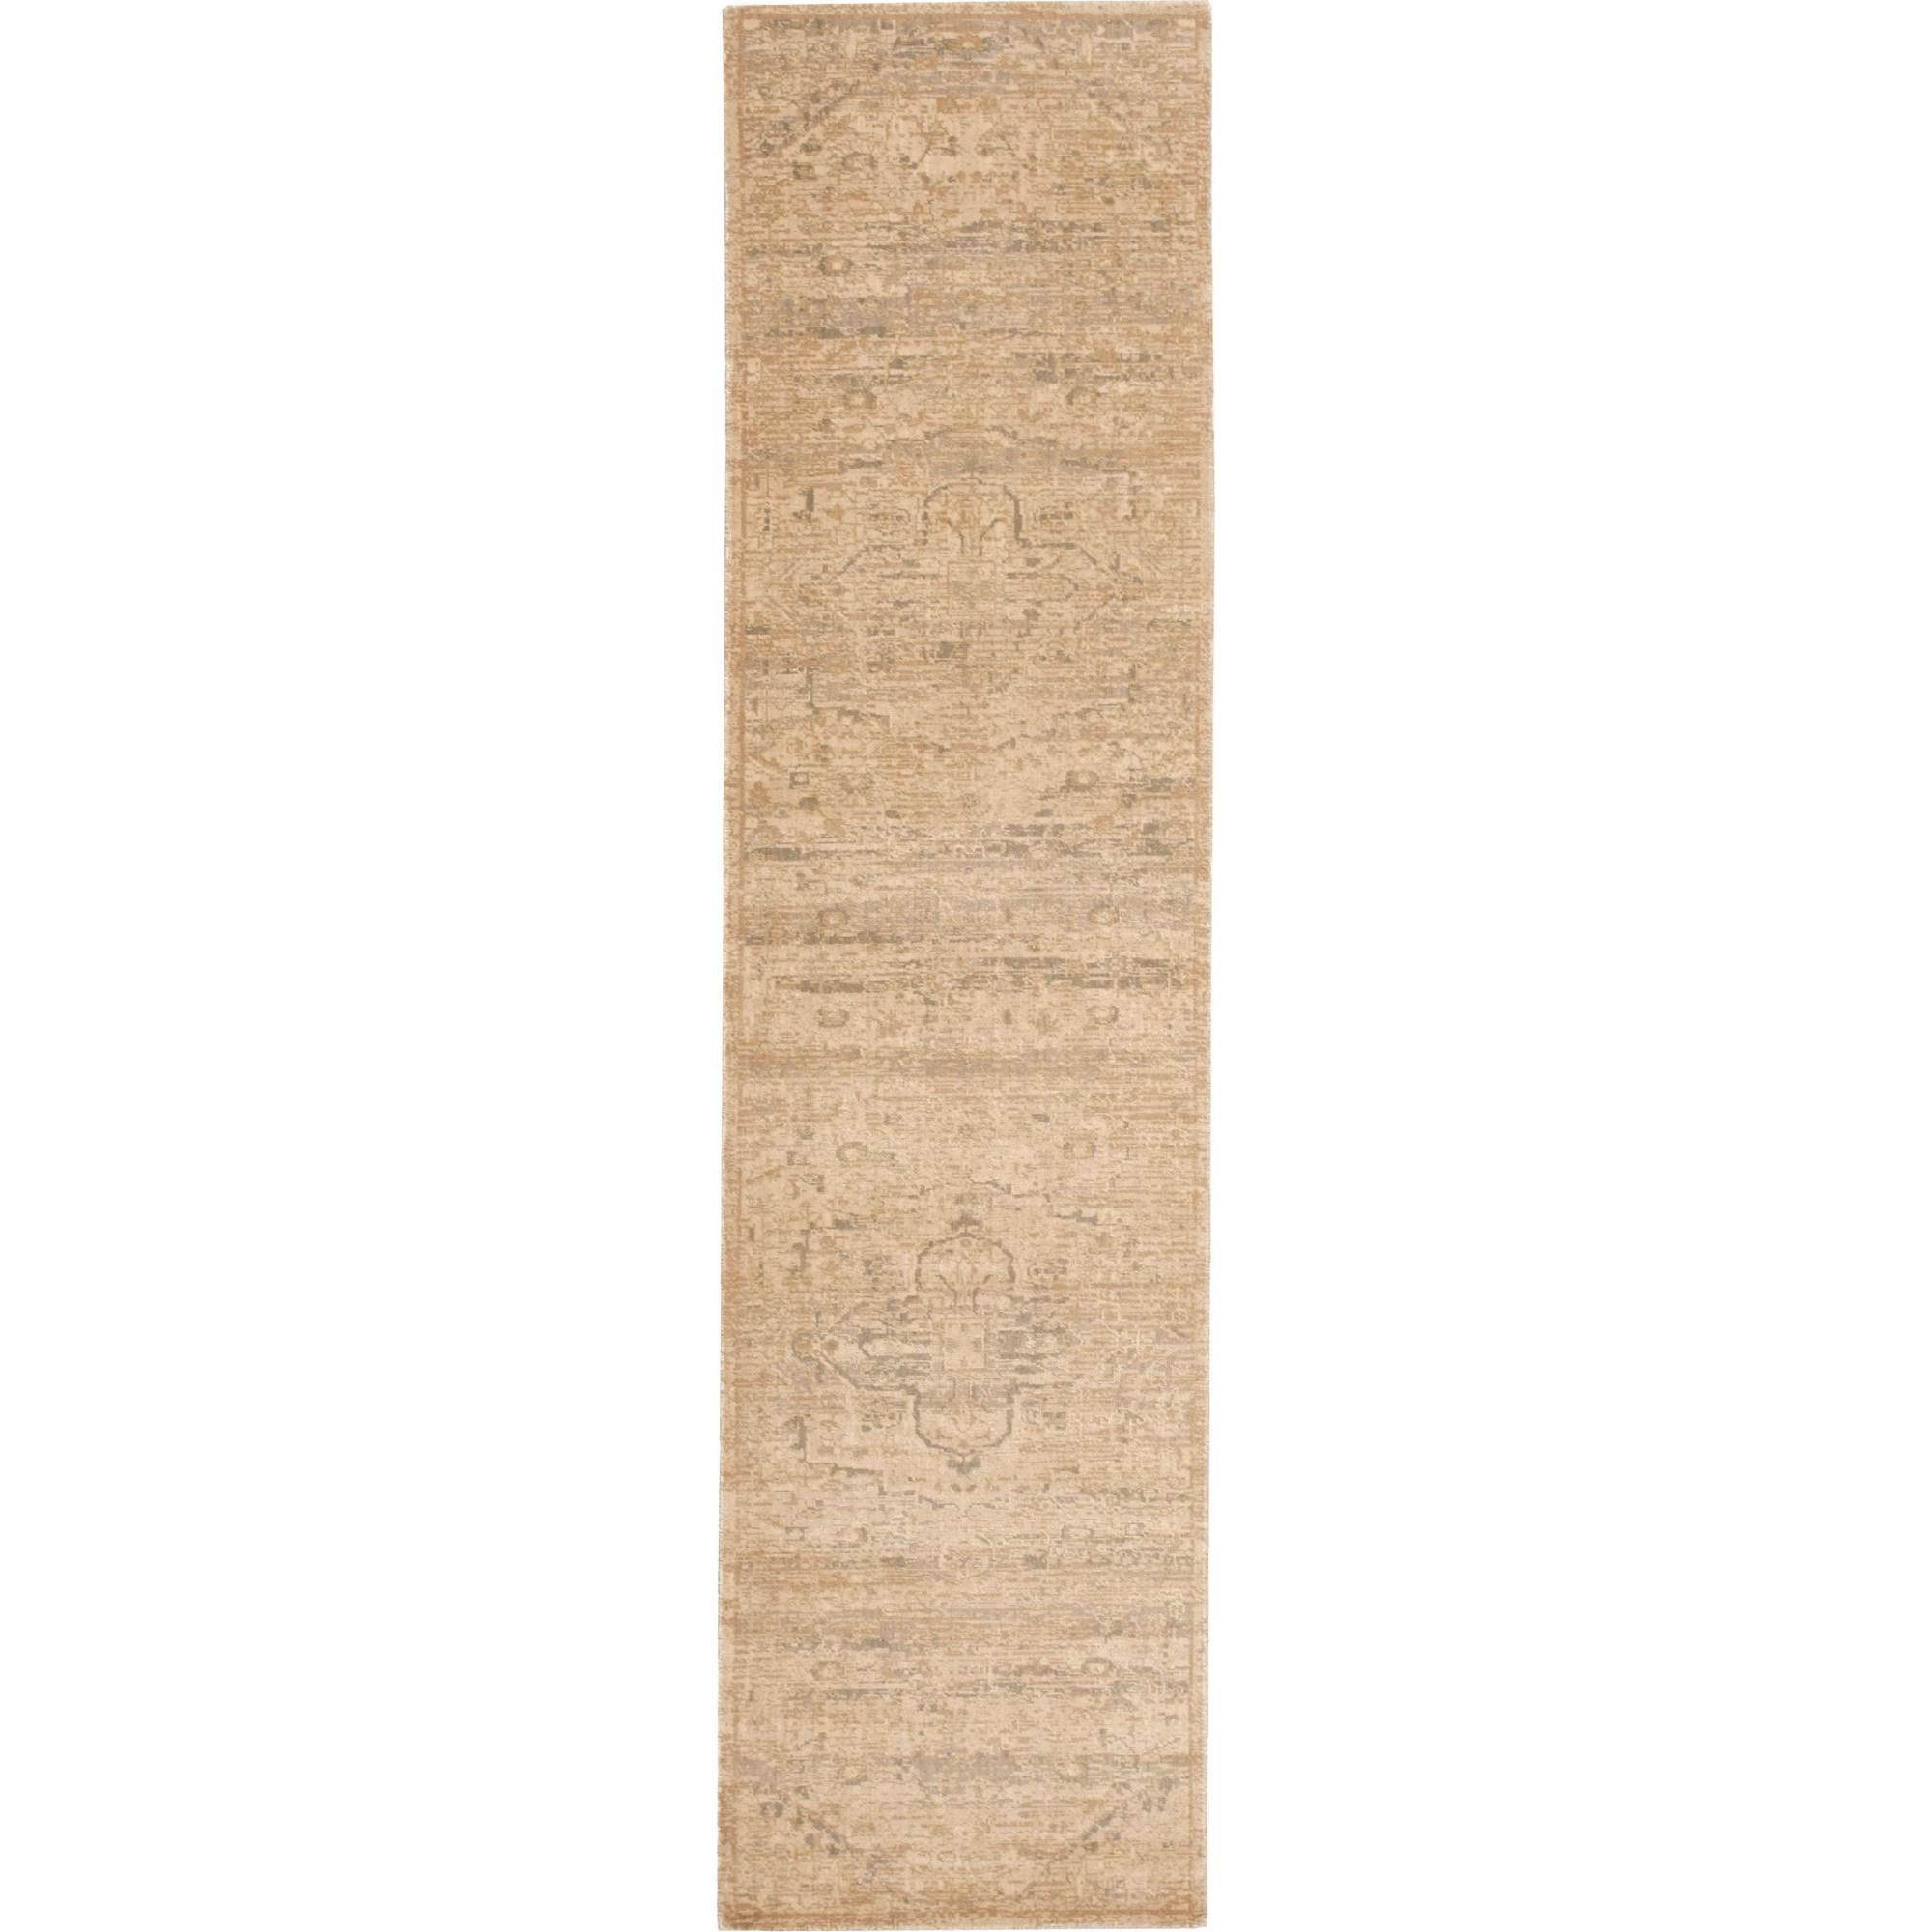 "Nourison Silk Elements 2'5"" x 10' Sand Area Rug - Item Number: 18896"